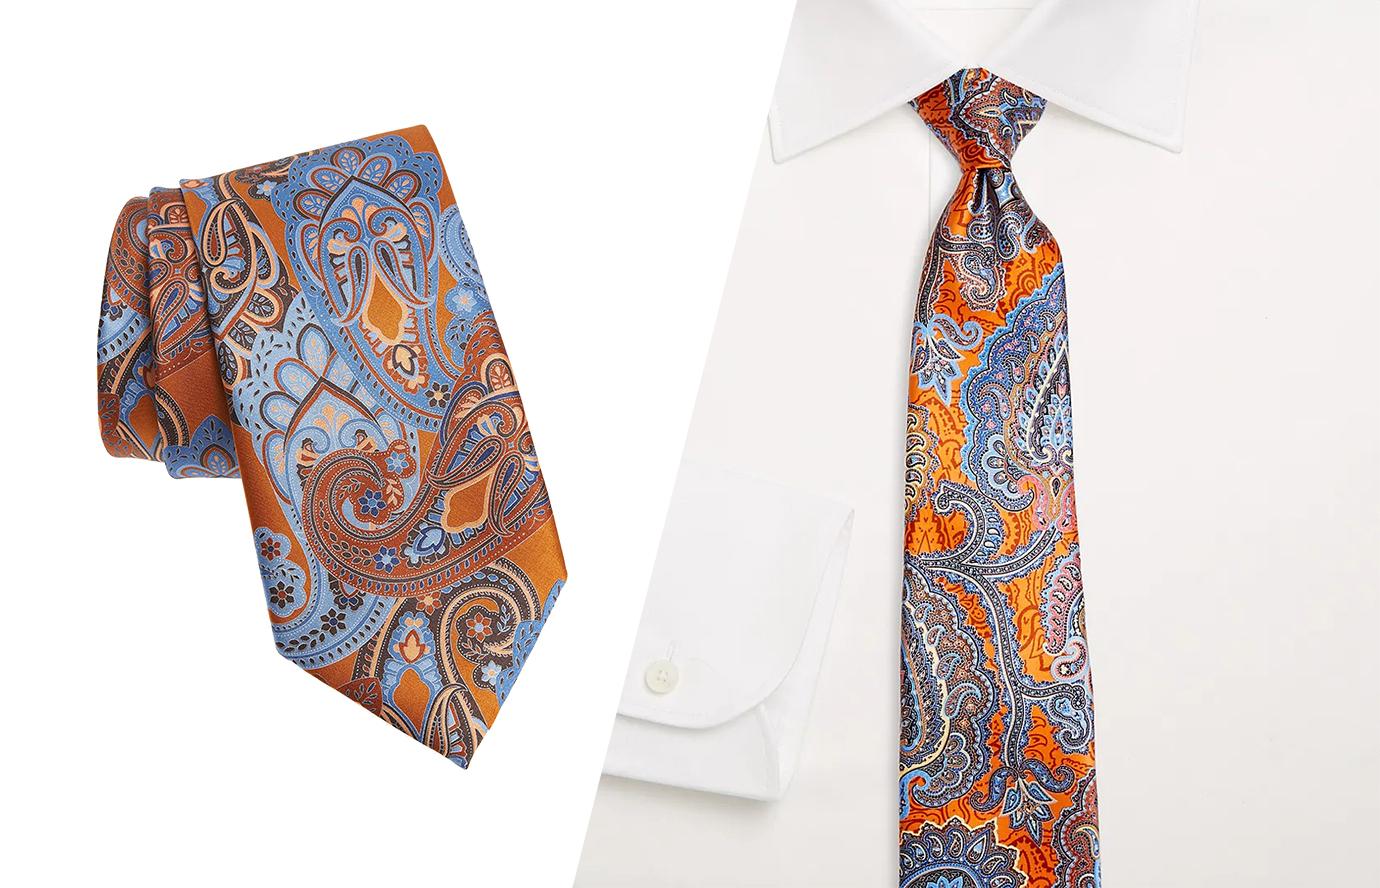 suit accessories: the tie